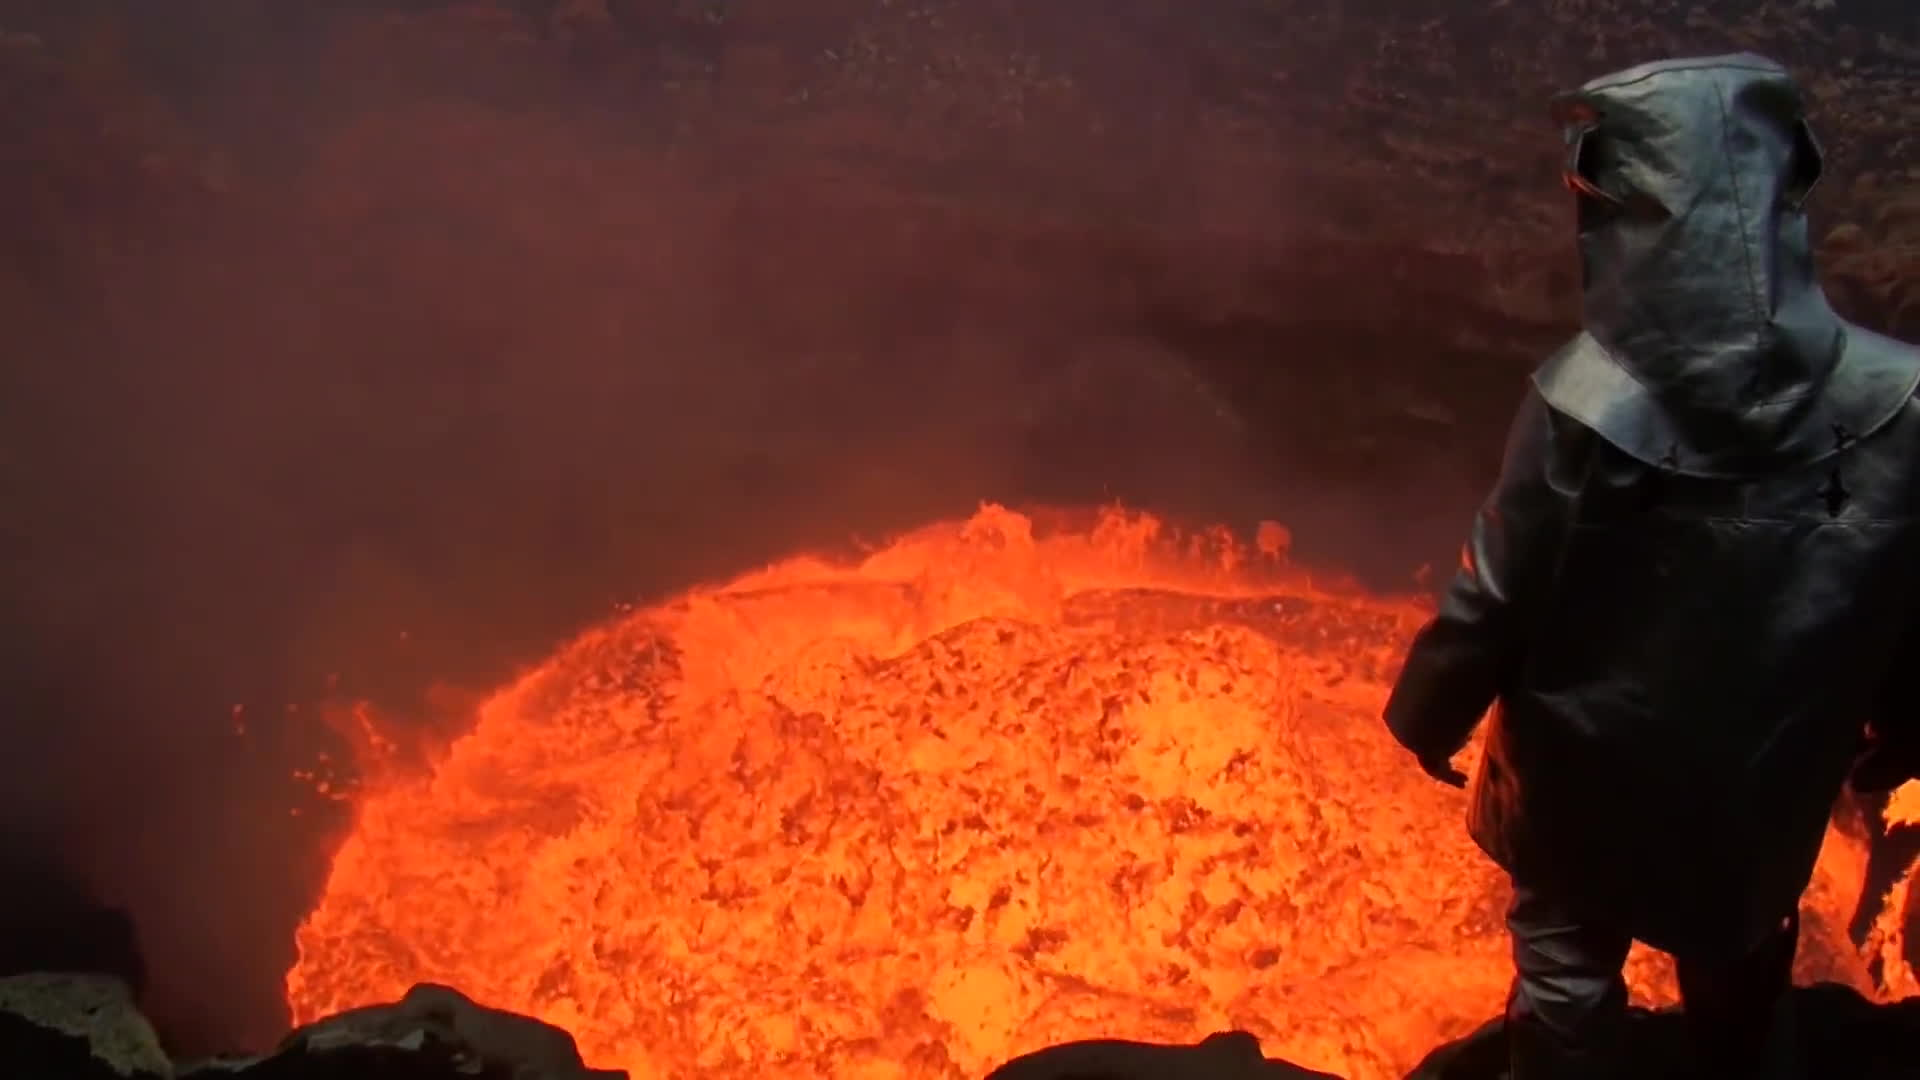 BeAmazed, SweatyPalms, beamazed, lava, magma, nature, sweatypalms, volcano, volcano islands (island group), Volcano Diver GIFs